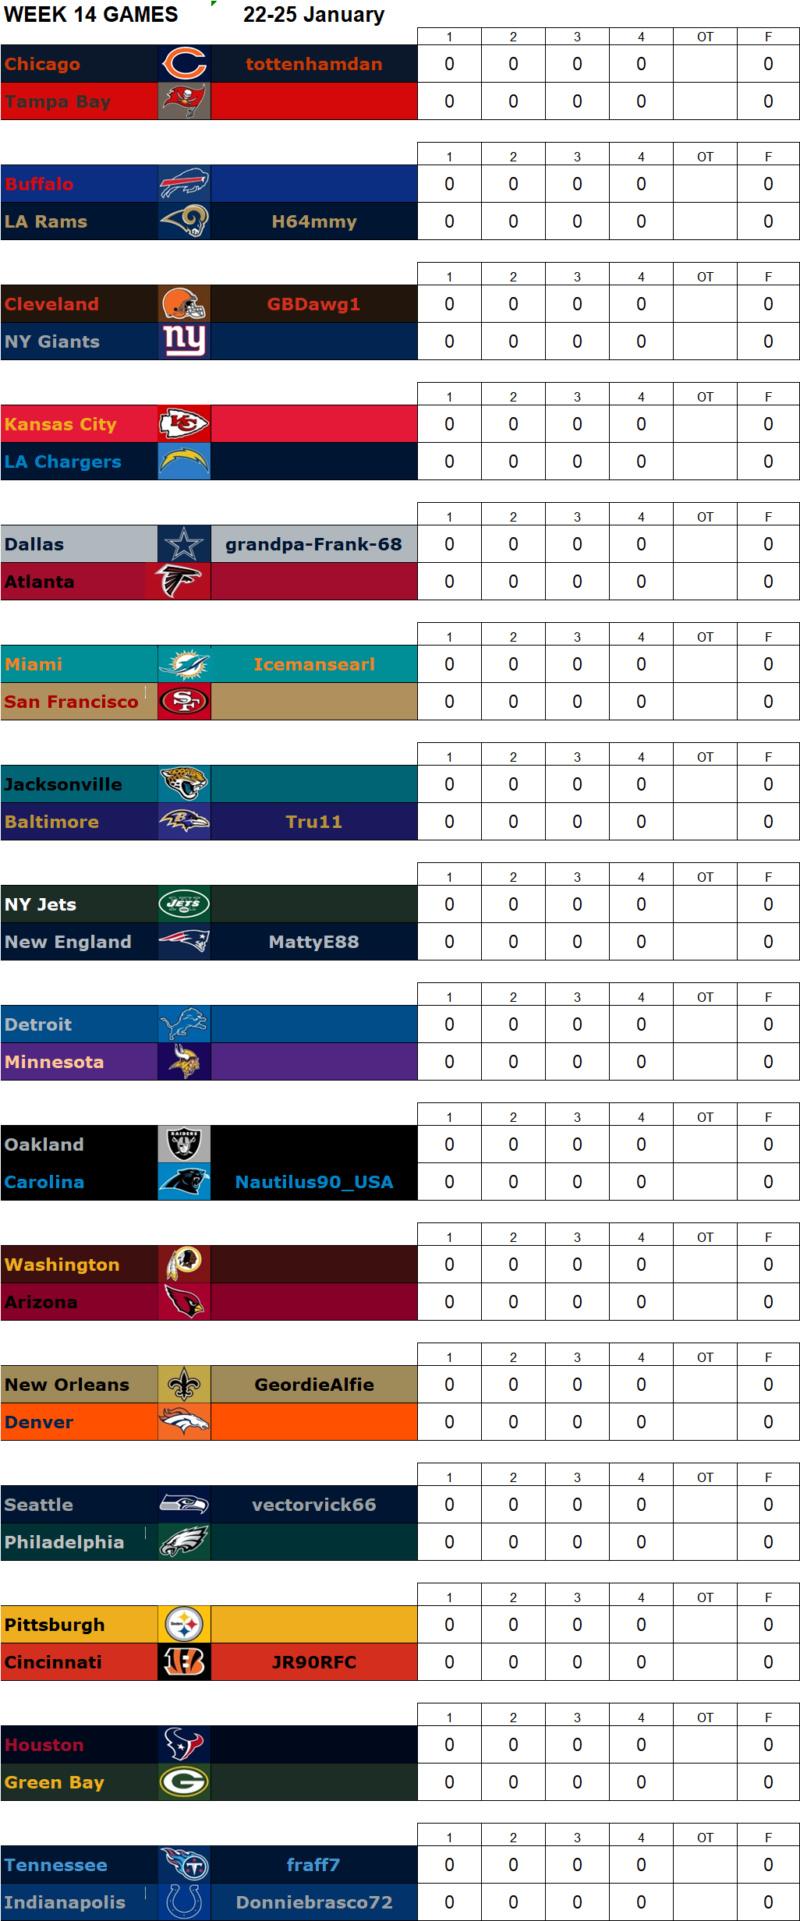 Week 14 Matchups, 22-25 January W14g19